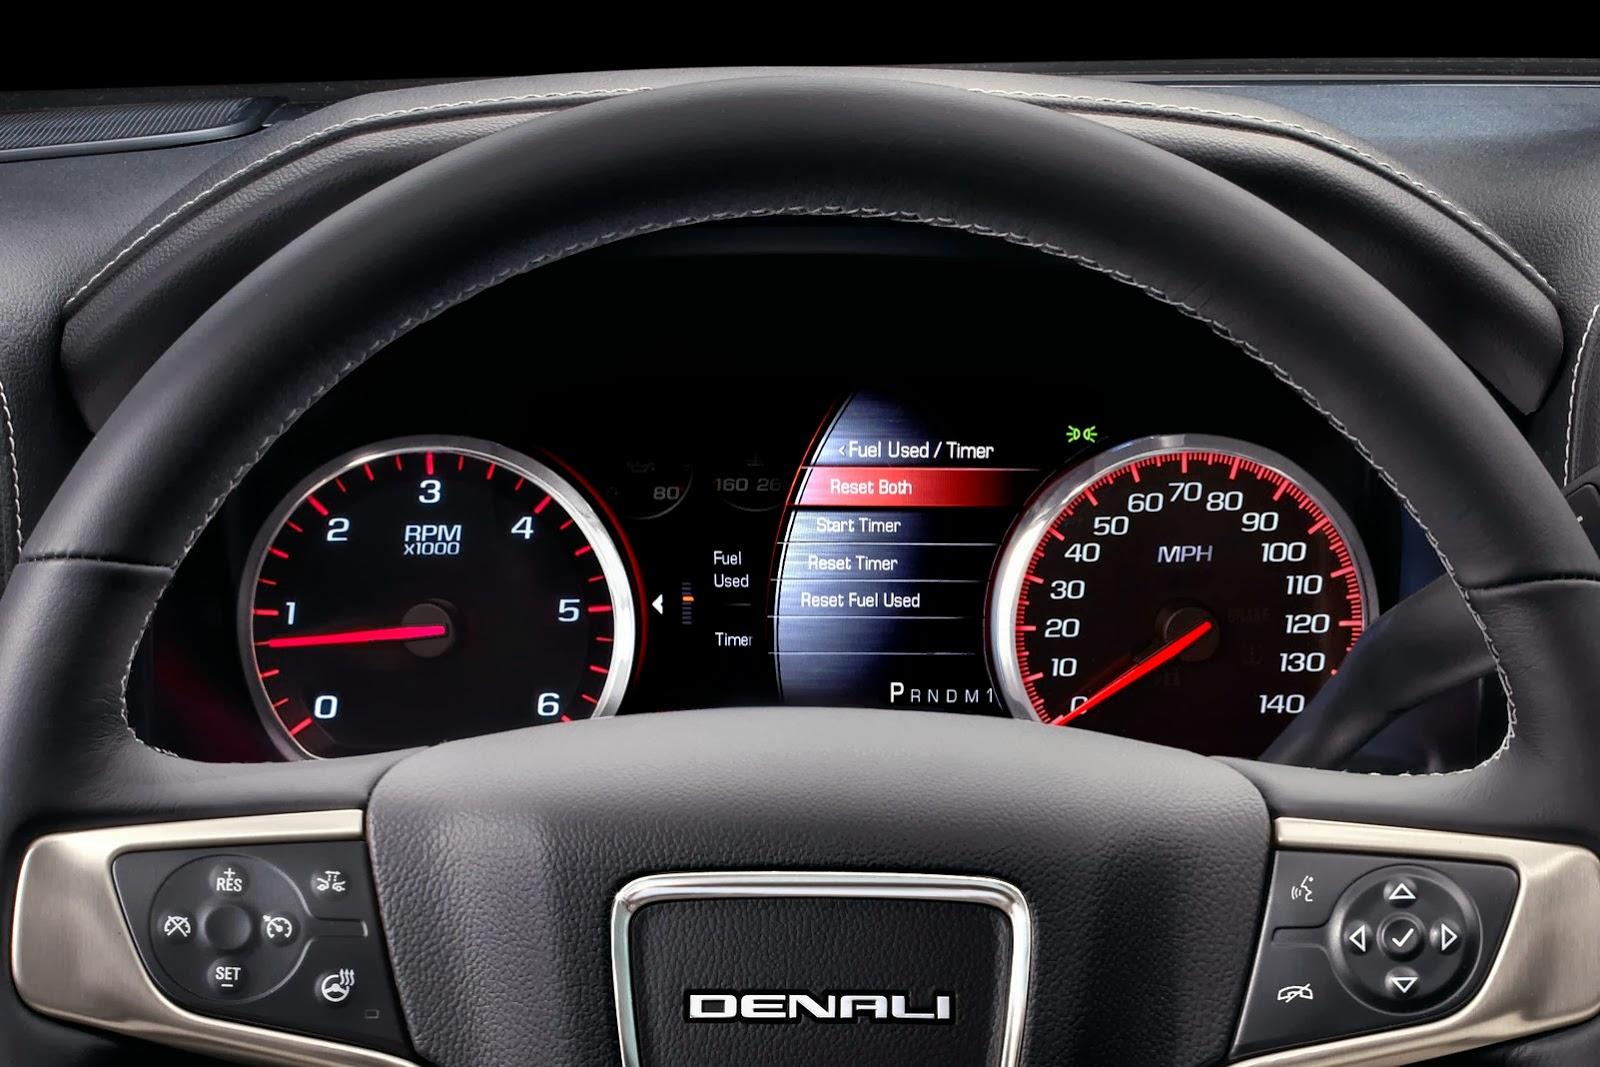 2015-GMC-Sierra-Denali-HD-010%25255B2%25255D.jpg